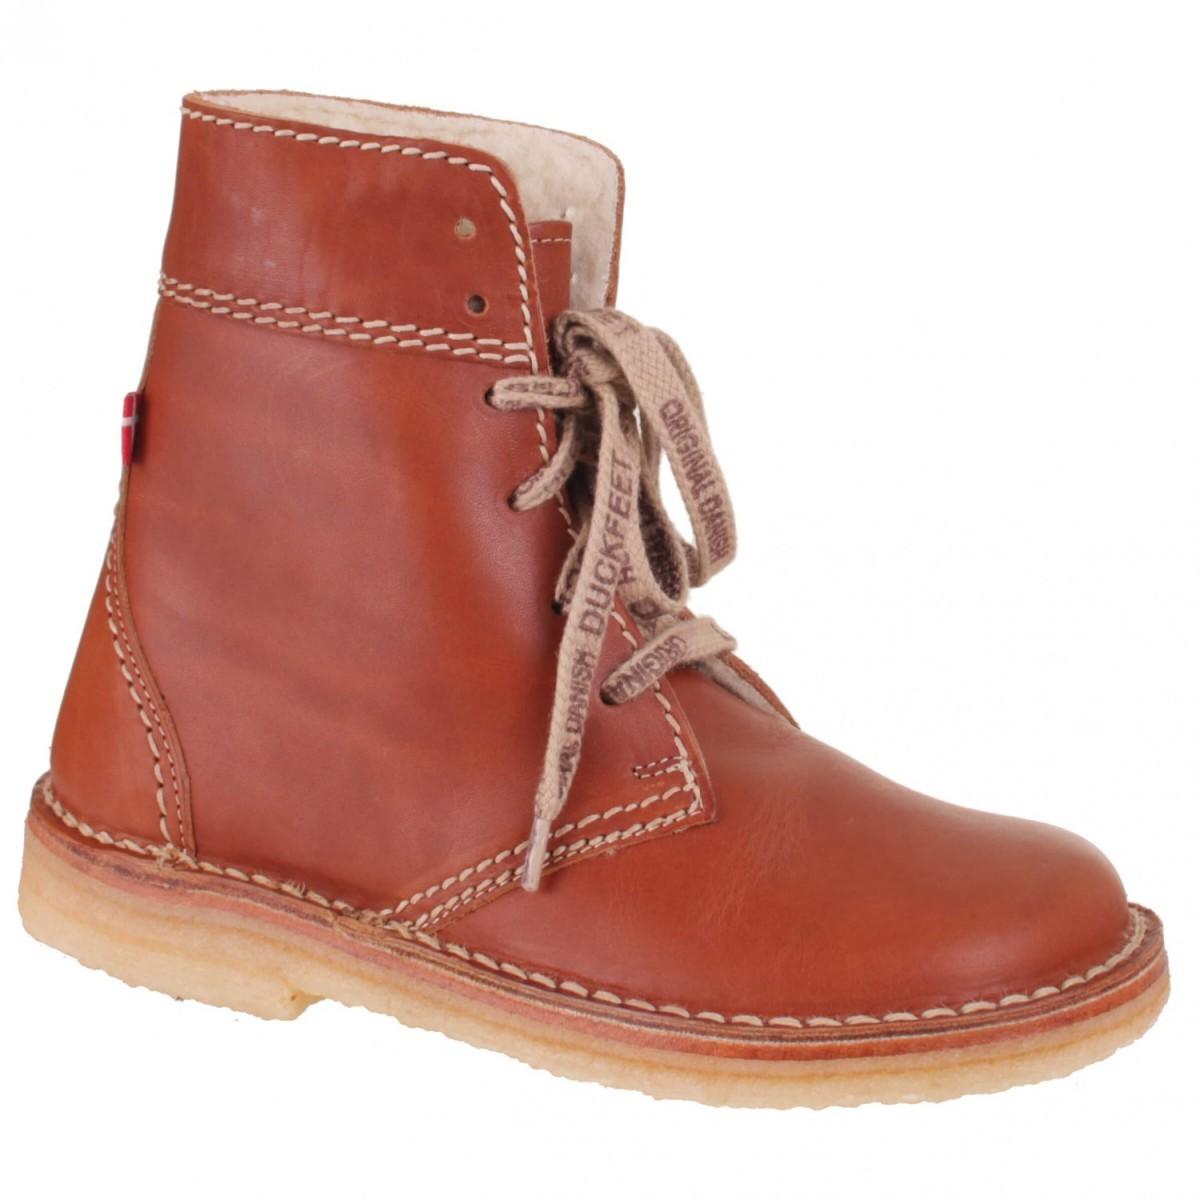 DUCKFEET ダックフィート Odense ( Brown ) ★ 登山靴 ・ 靴 ・ 登山 ・ アウトドアシューズ ・ 山歩き ★